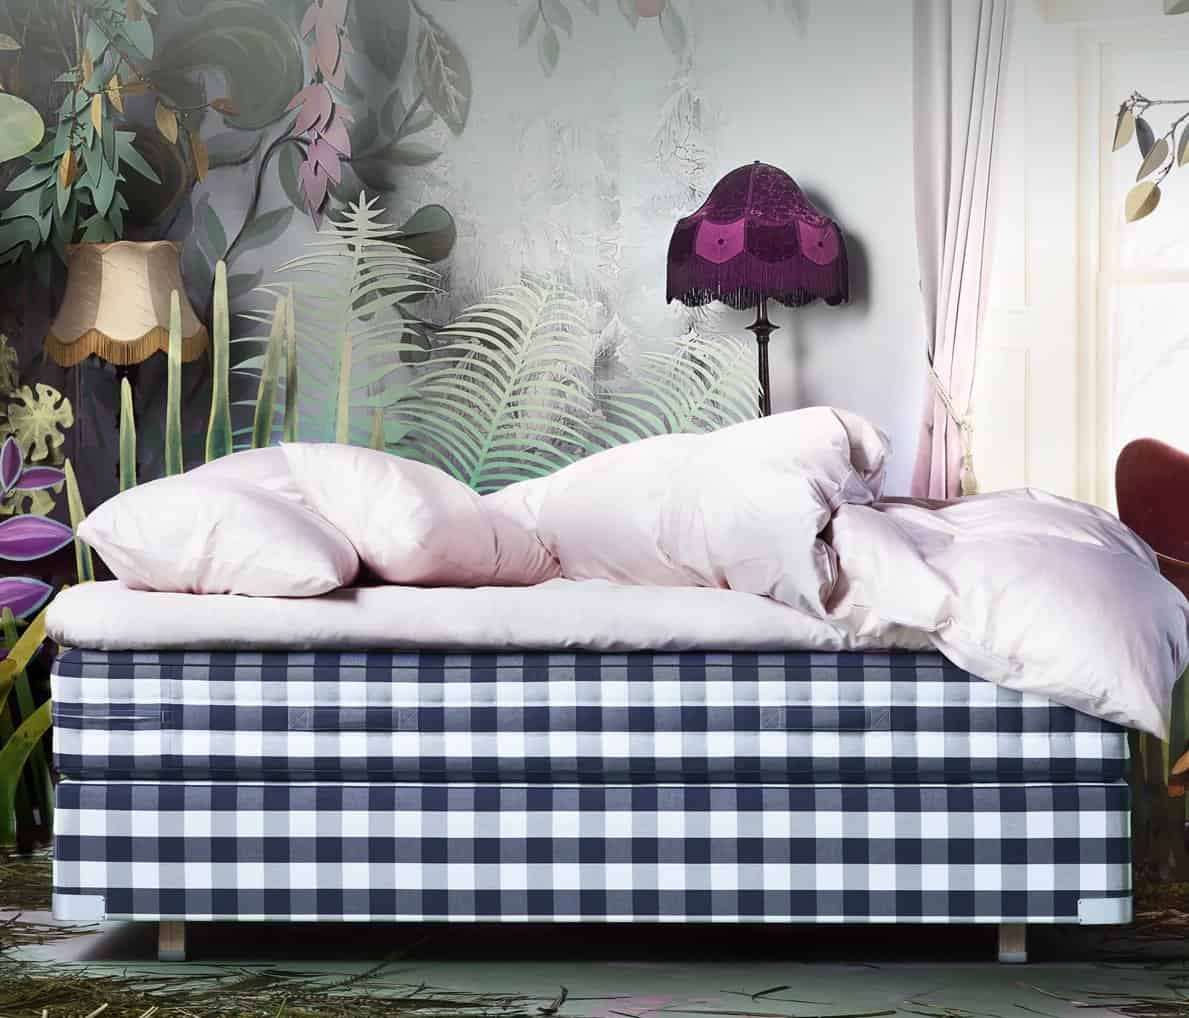 Hästens handmade luxury beds - the world's best beds